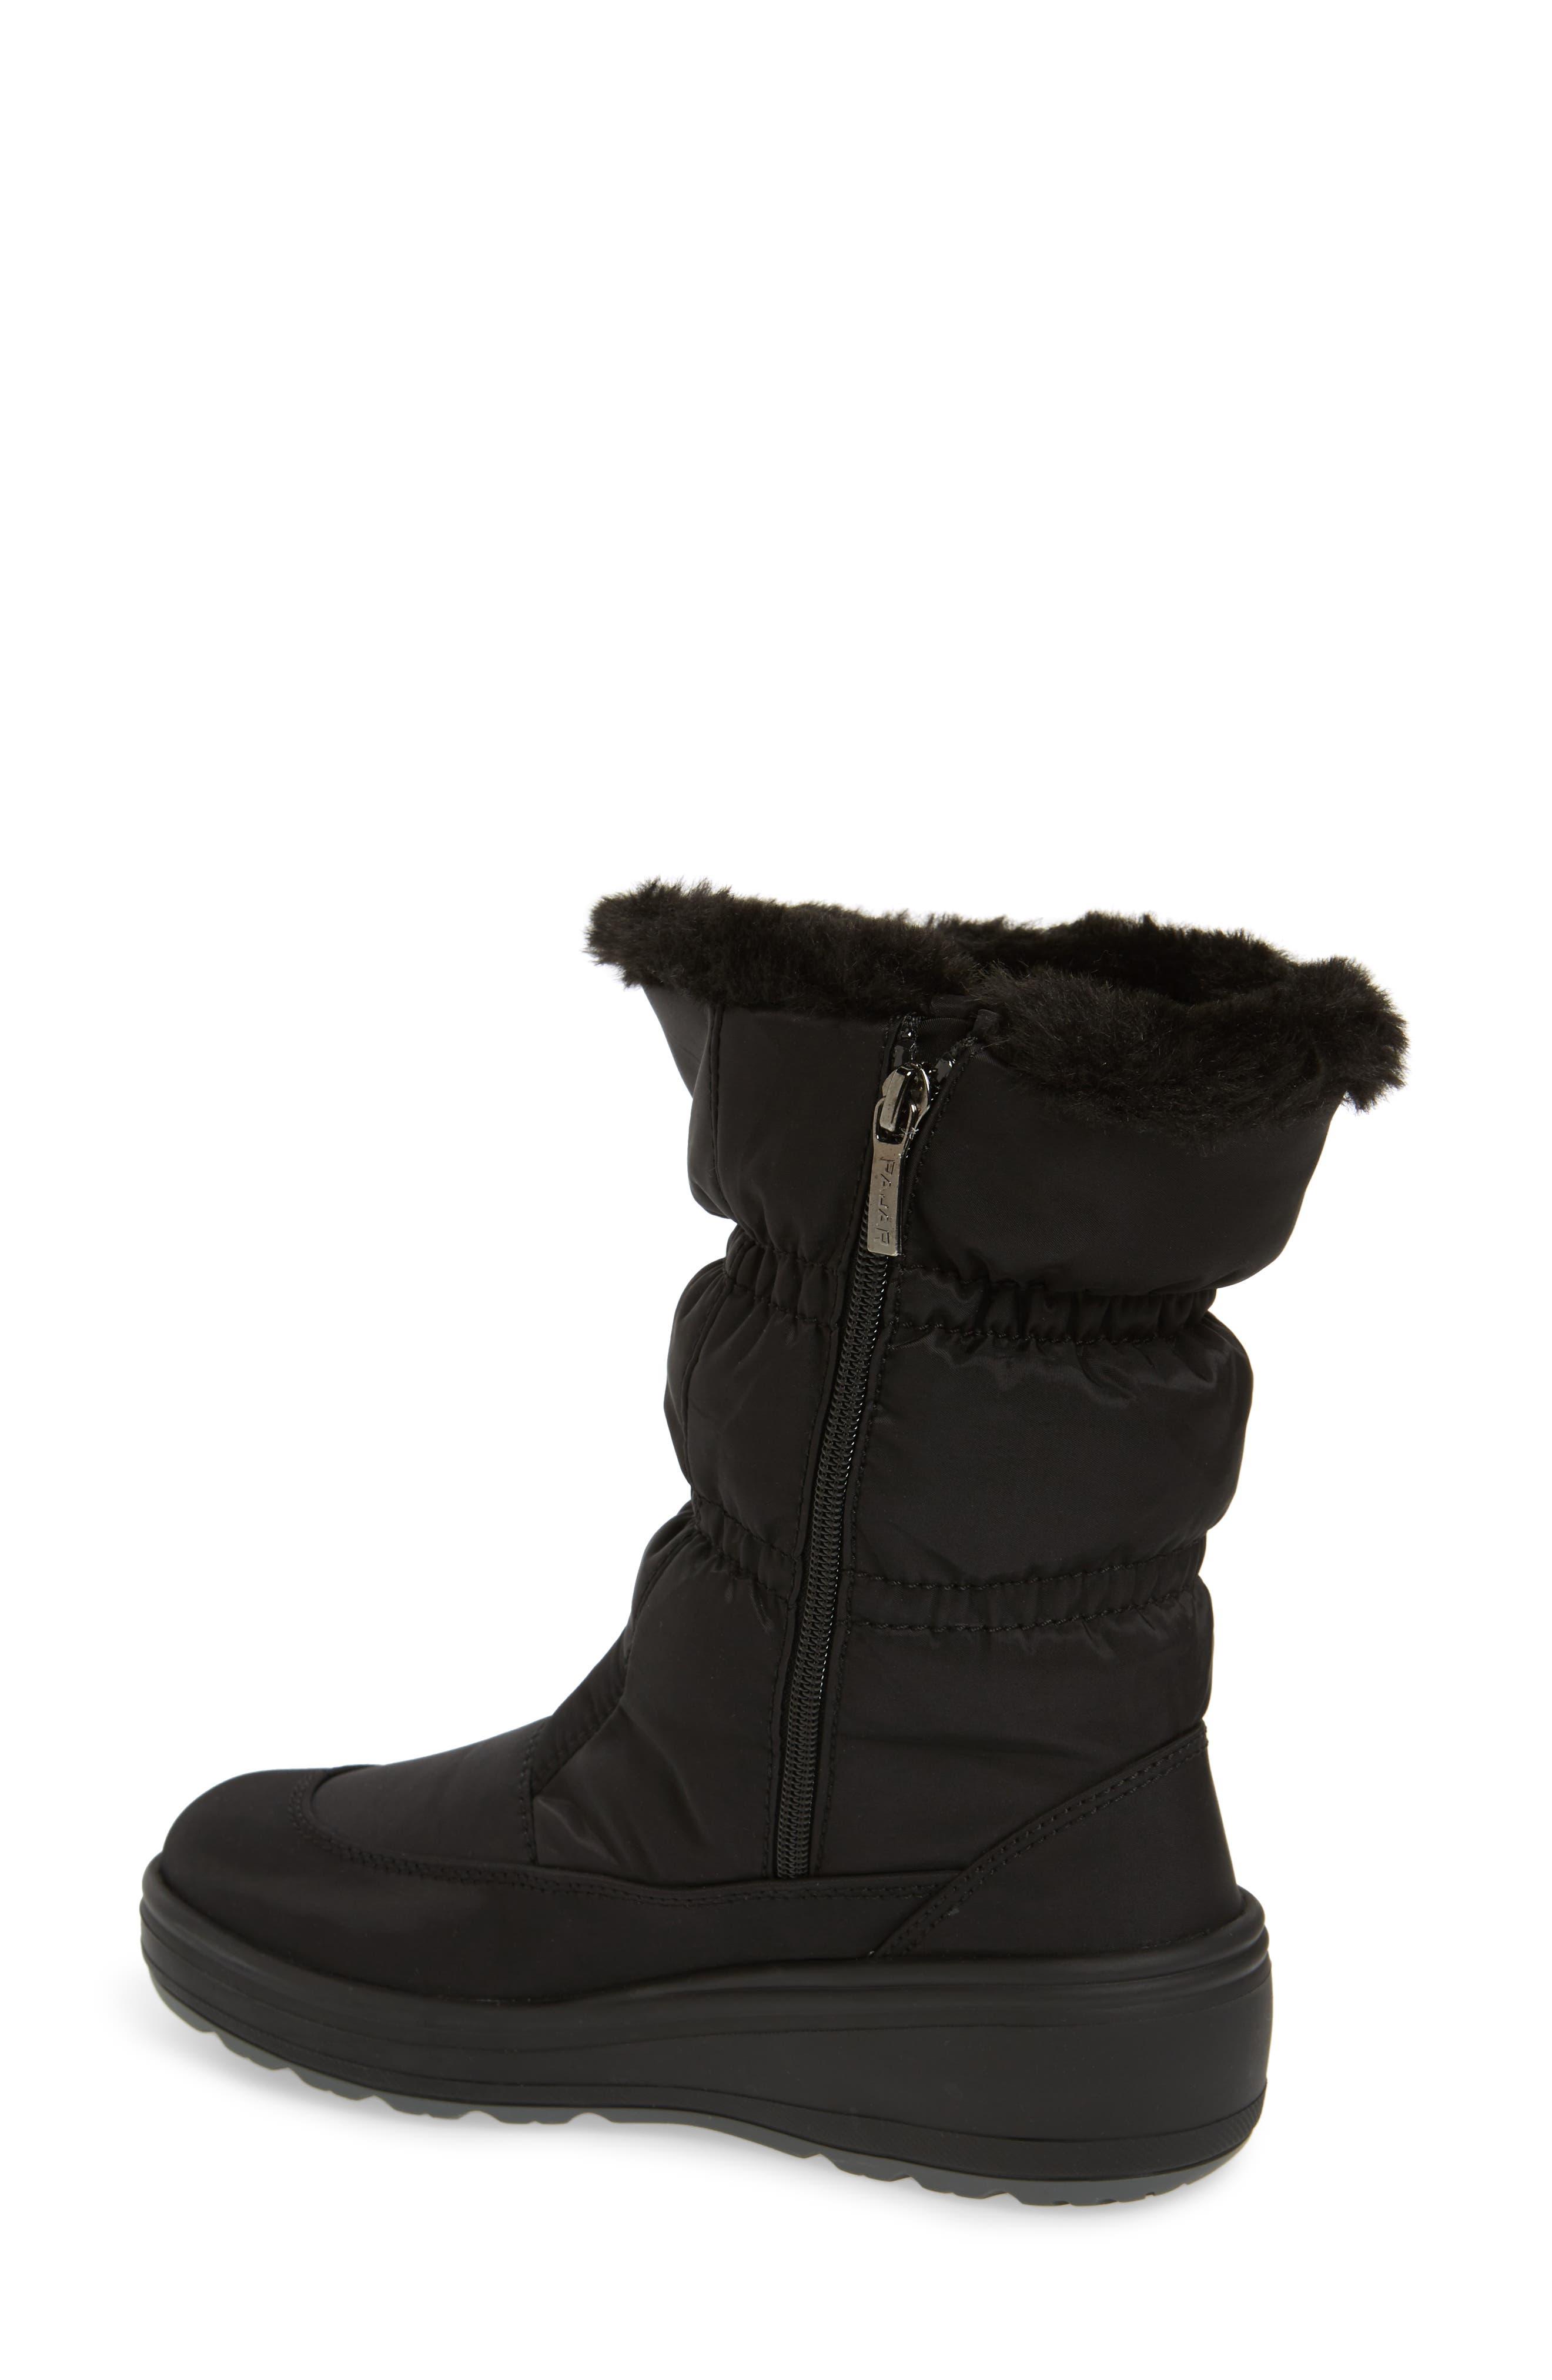 Snowcap Waterproof Insulated Winter Boot,                             Alternate thumbnail 2, color,                             BLACK FABRIC